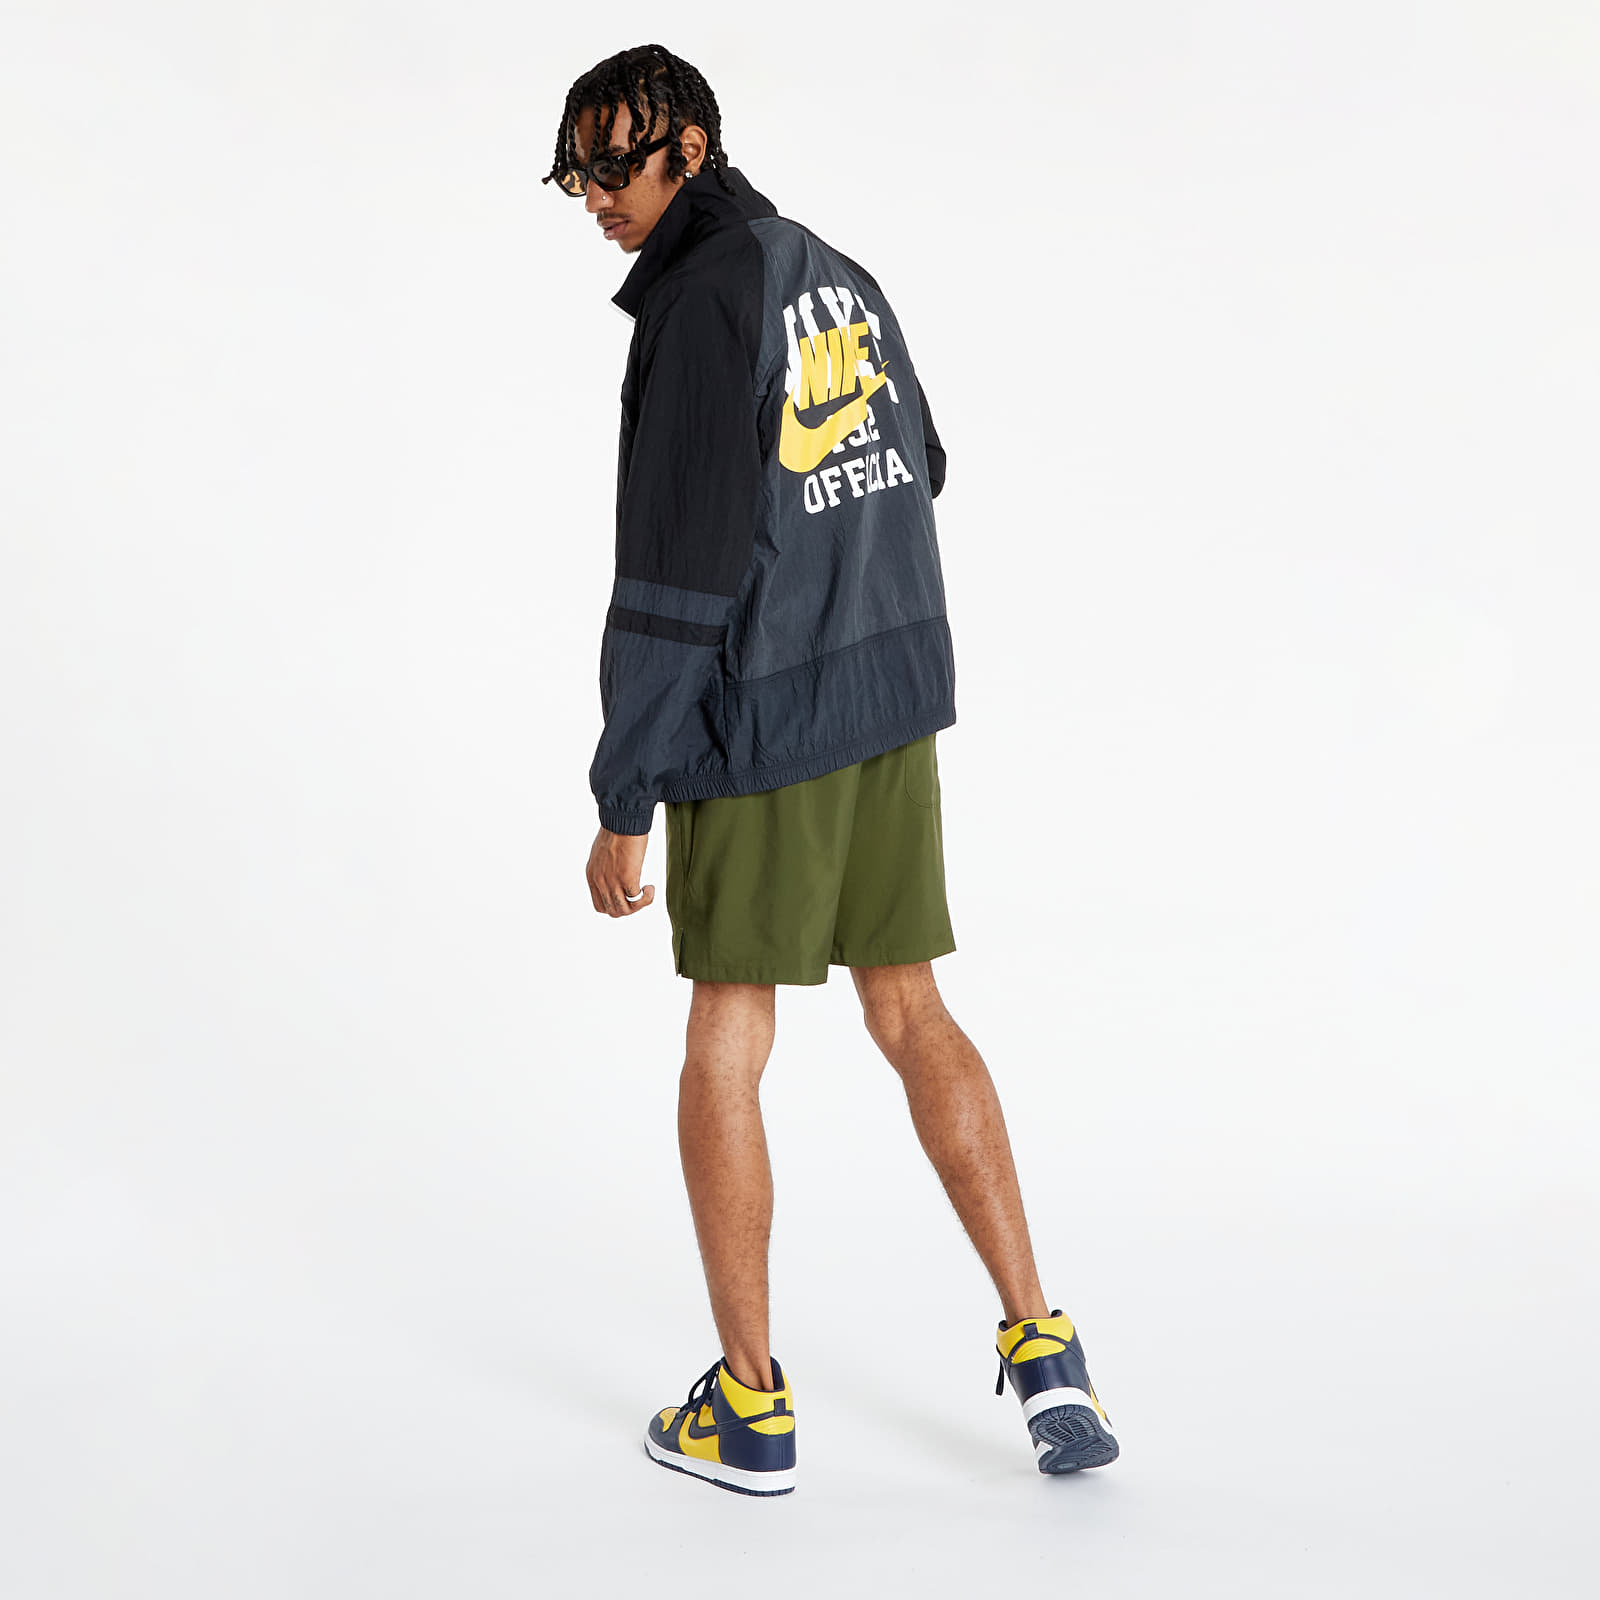 Nike Sportswear M Unlined Jacket Anthracite/ Black/ Off Noir/ White S